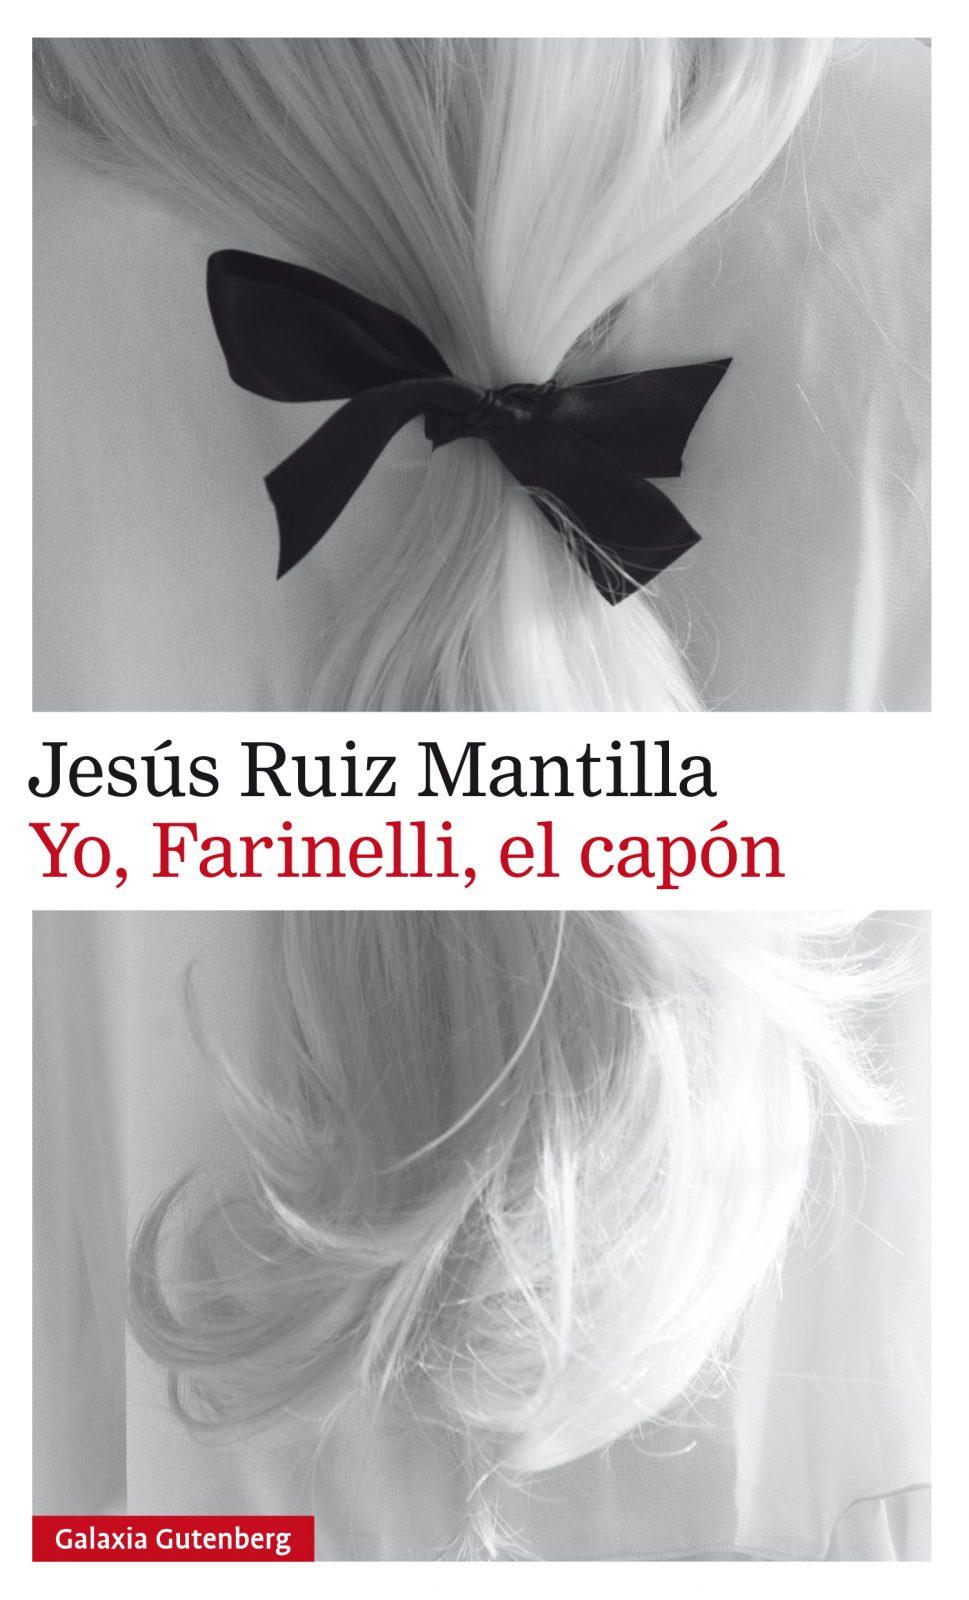 YO, FARINELLI, EL CAPON